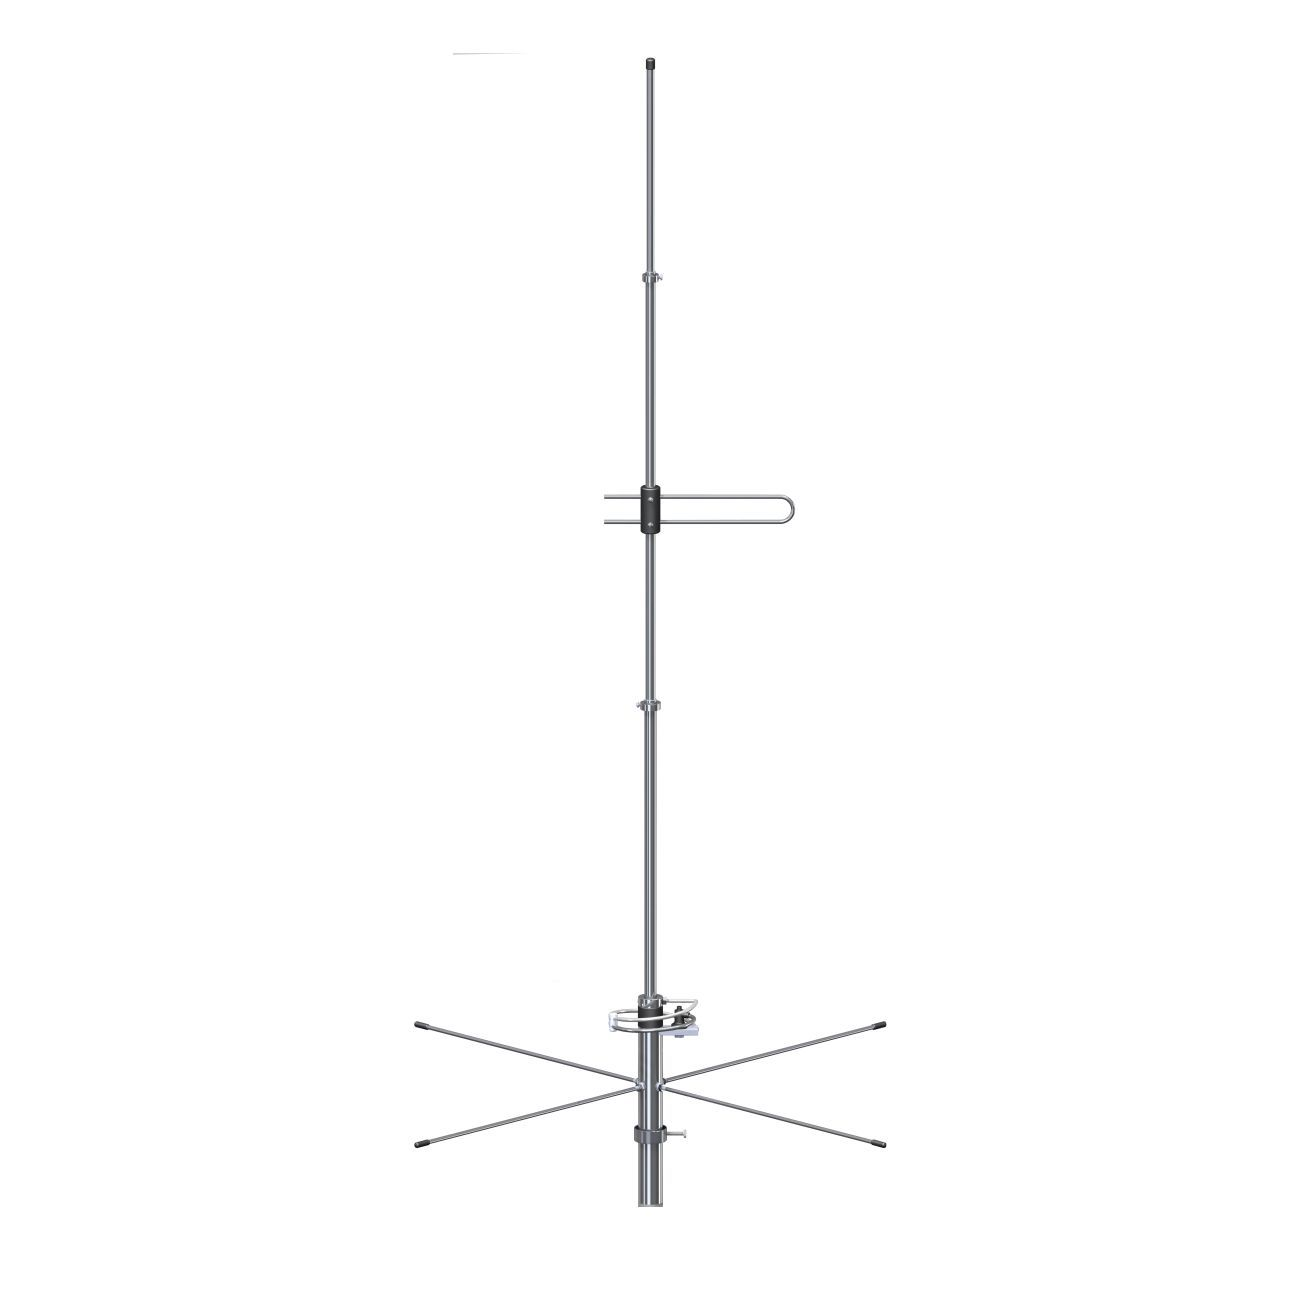 Antena Base VHF 2x5/8 de Onda 6 DB Steelbras - AP0249